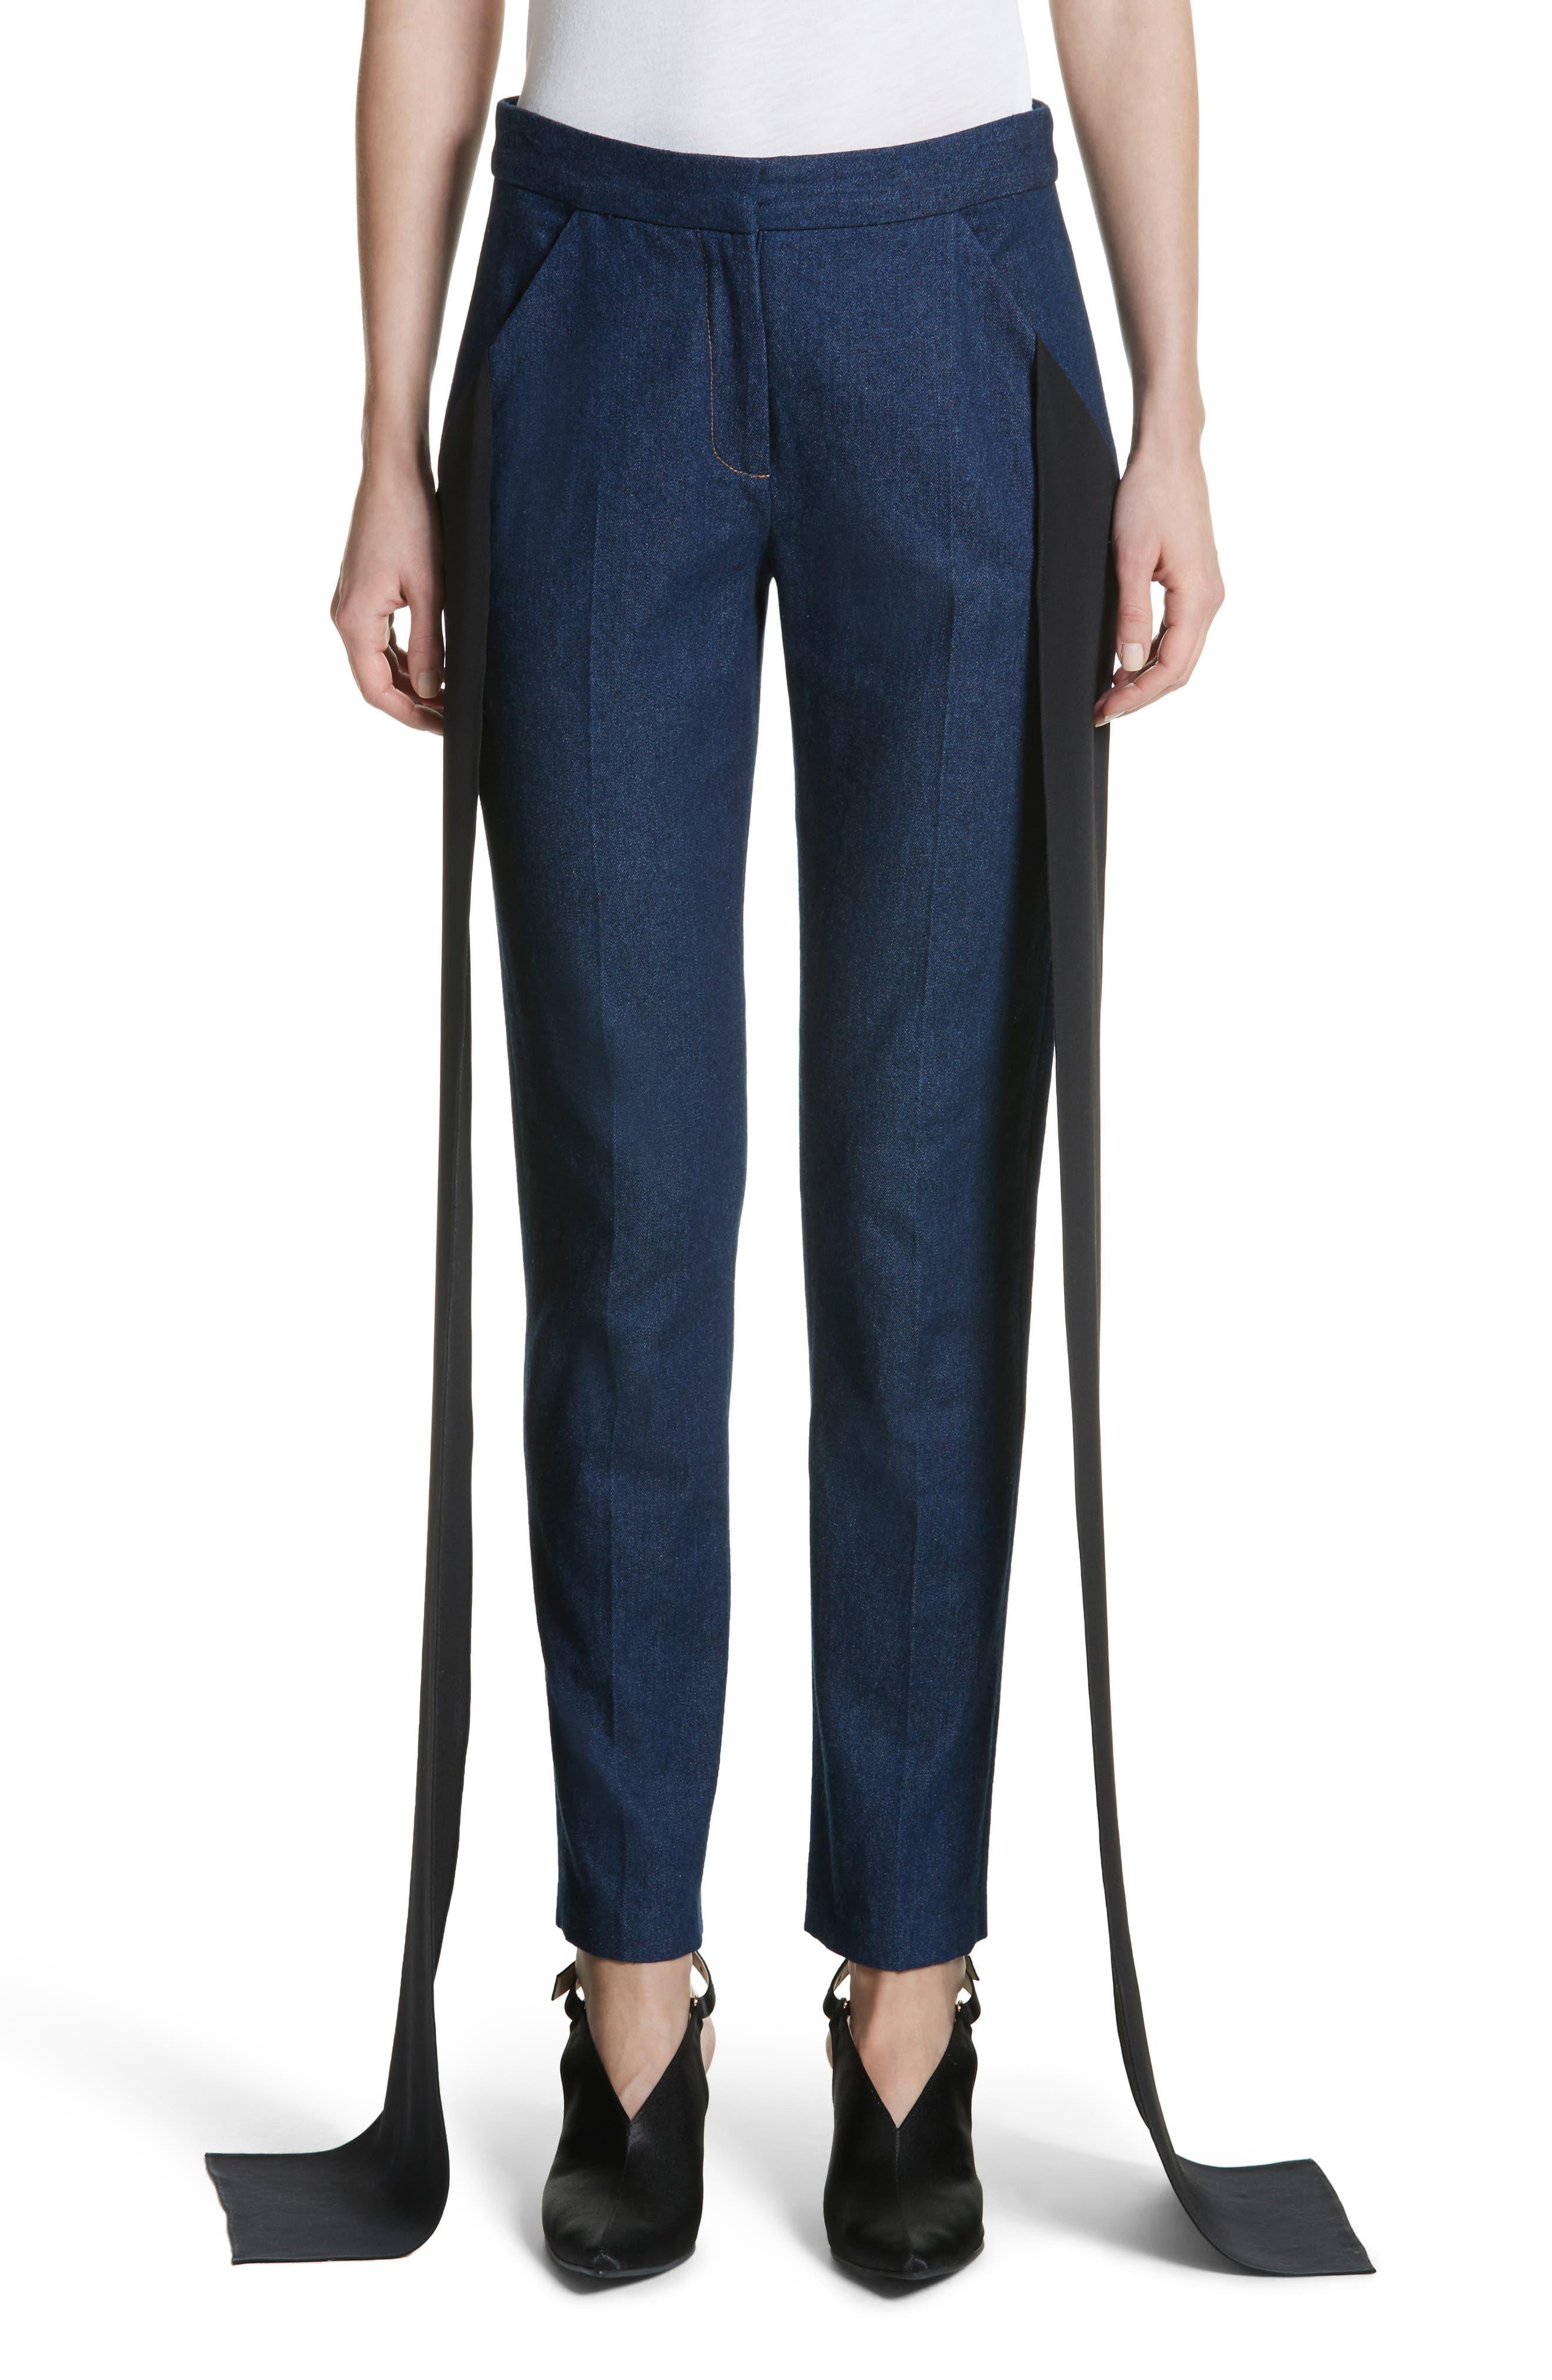 Mojave Side Panel Skinny Jeans,                         Main,                         color, Dark Wash Denim